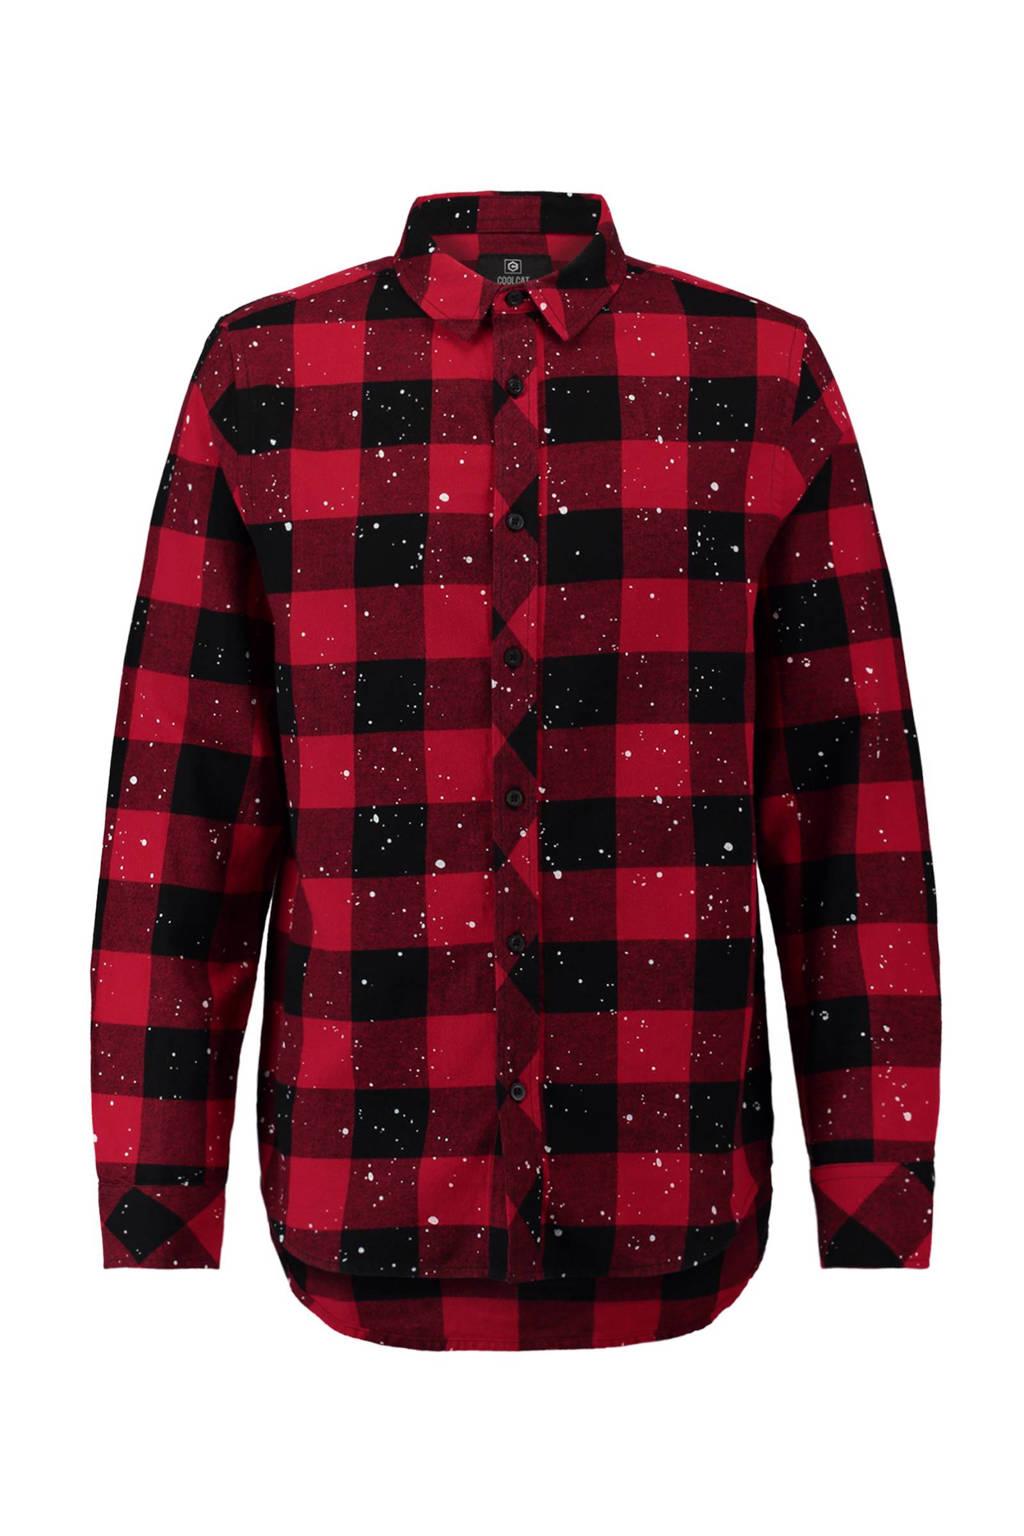 Rood Zwart Overhemd.Coolcat Geruit Overhemd Rood Zwart Wehkamp